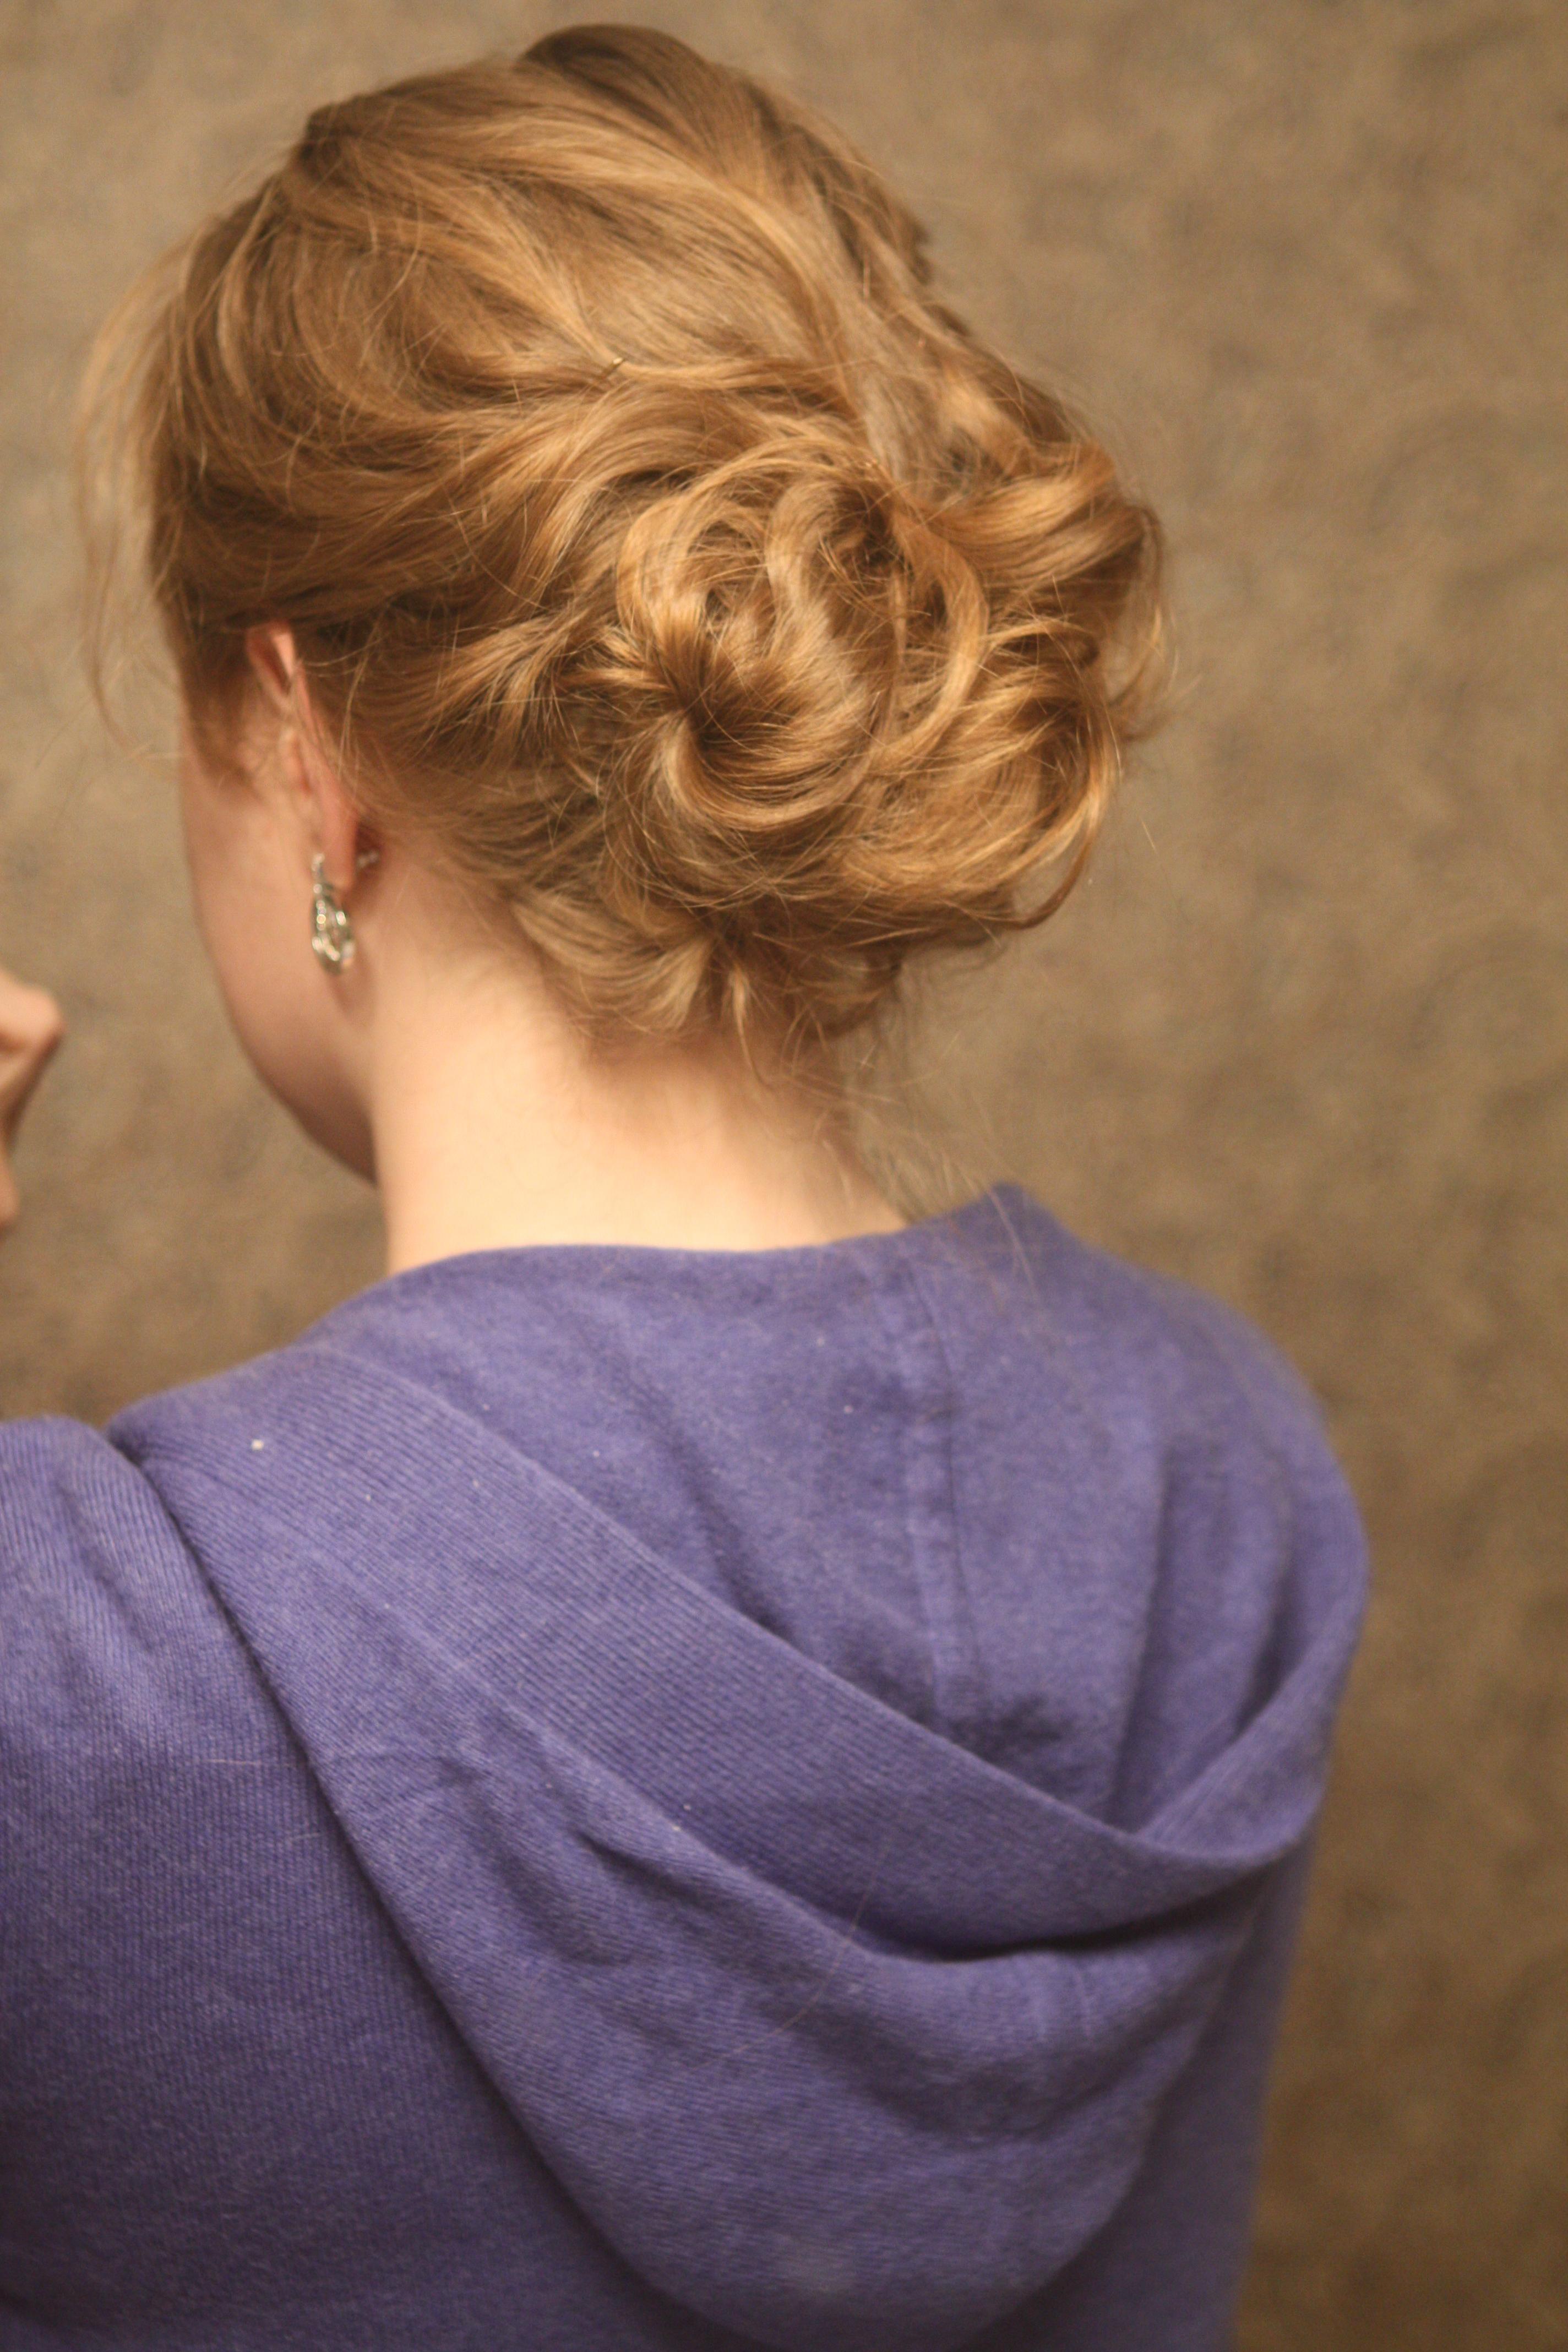 Beauty, DIY, Chignon, Updo, Curly Hair, Wavy Hair, Romantic, Hair, Wavy, Curly, Messy